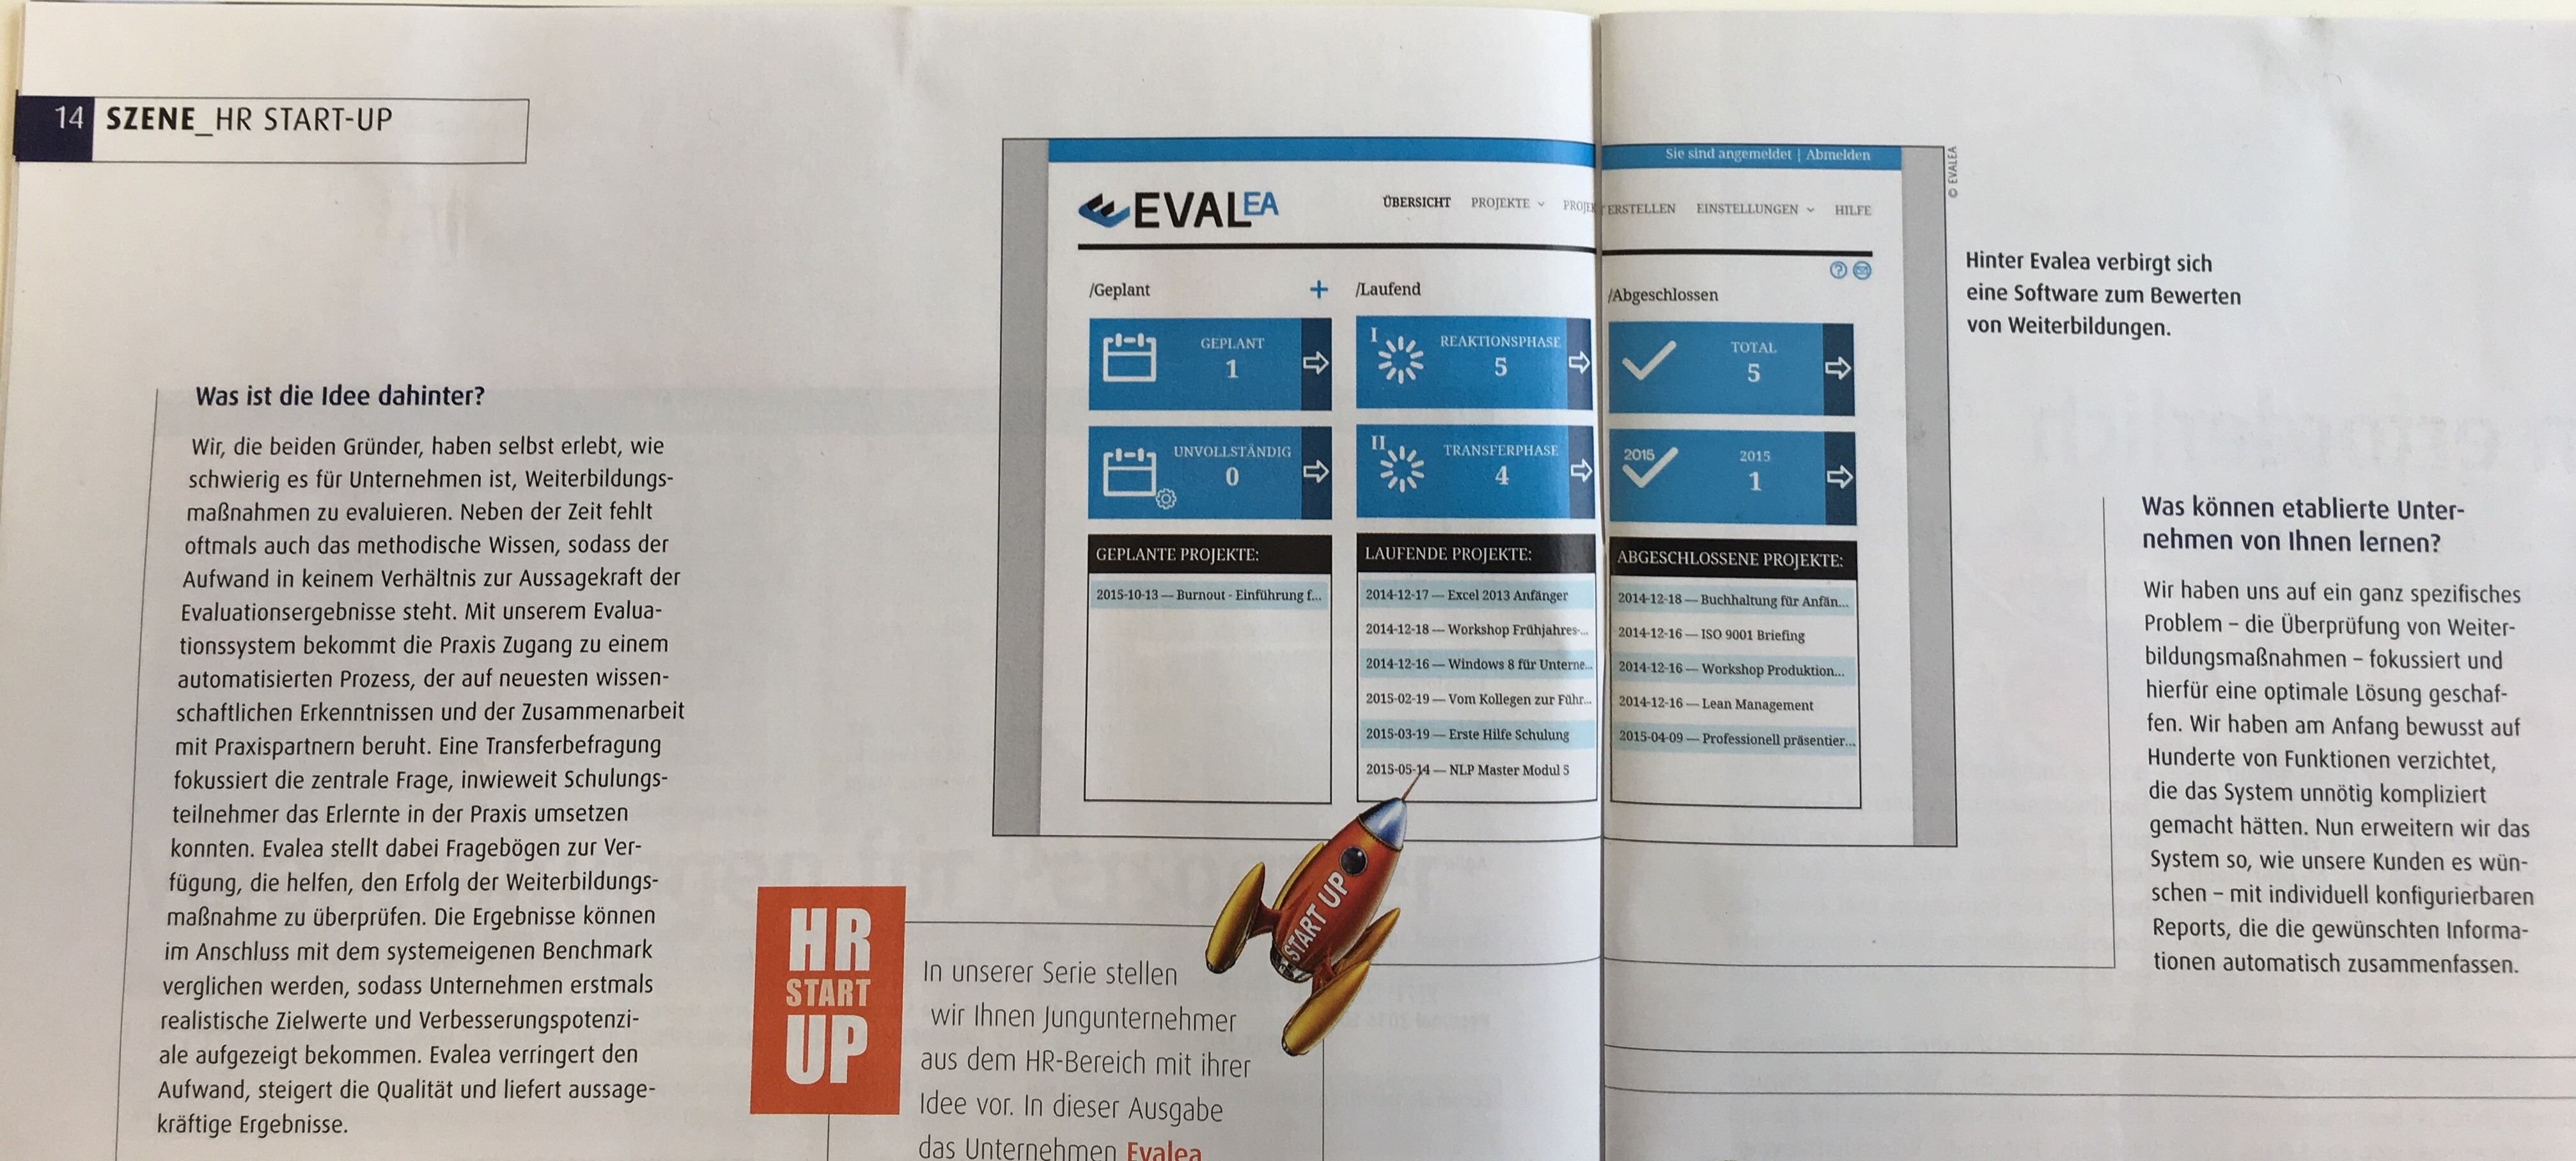 Evalea im Personalmagazin